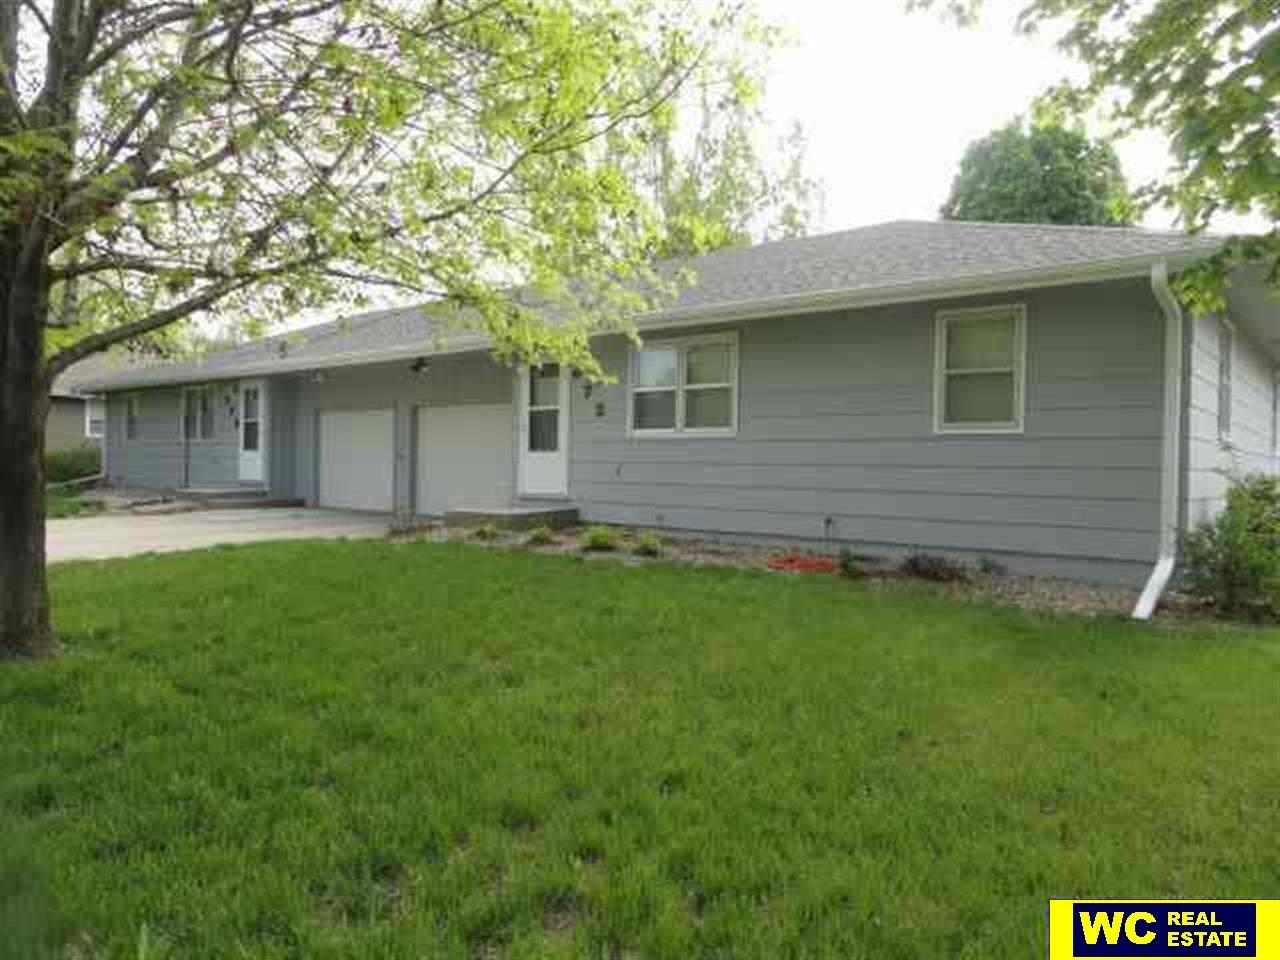 Real Estate for Sale, ListingId: 35896970, Blair,NE68008